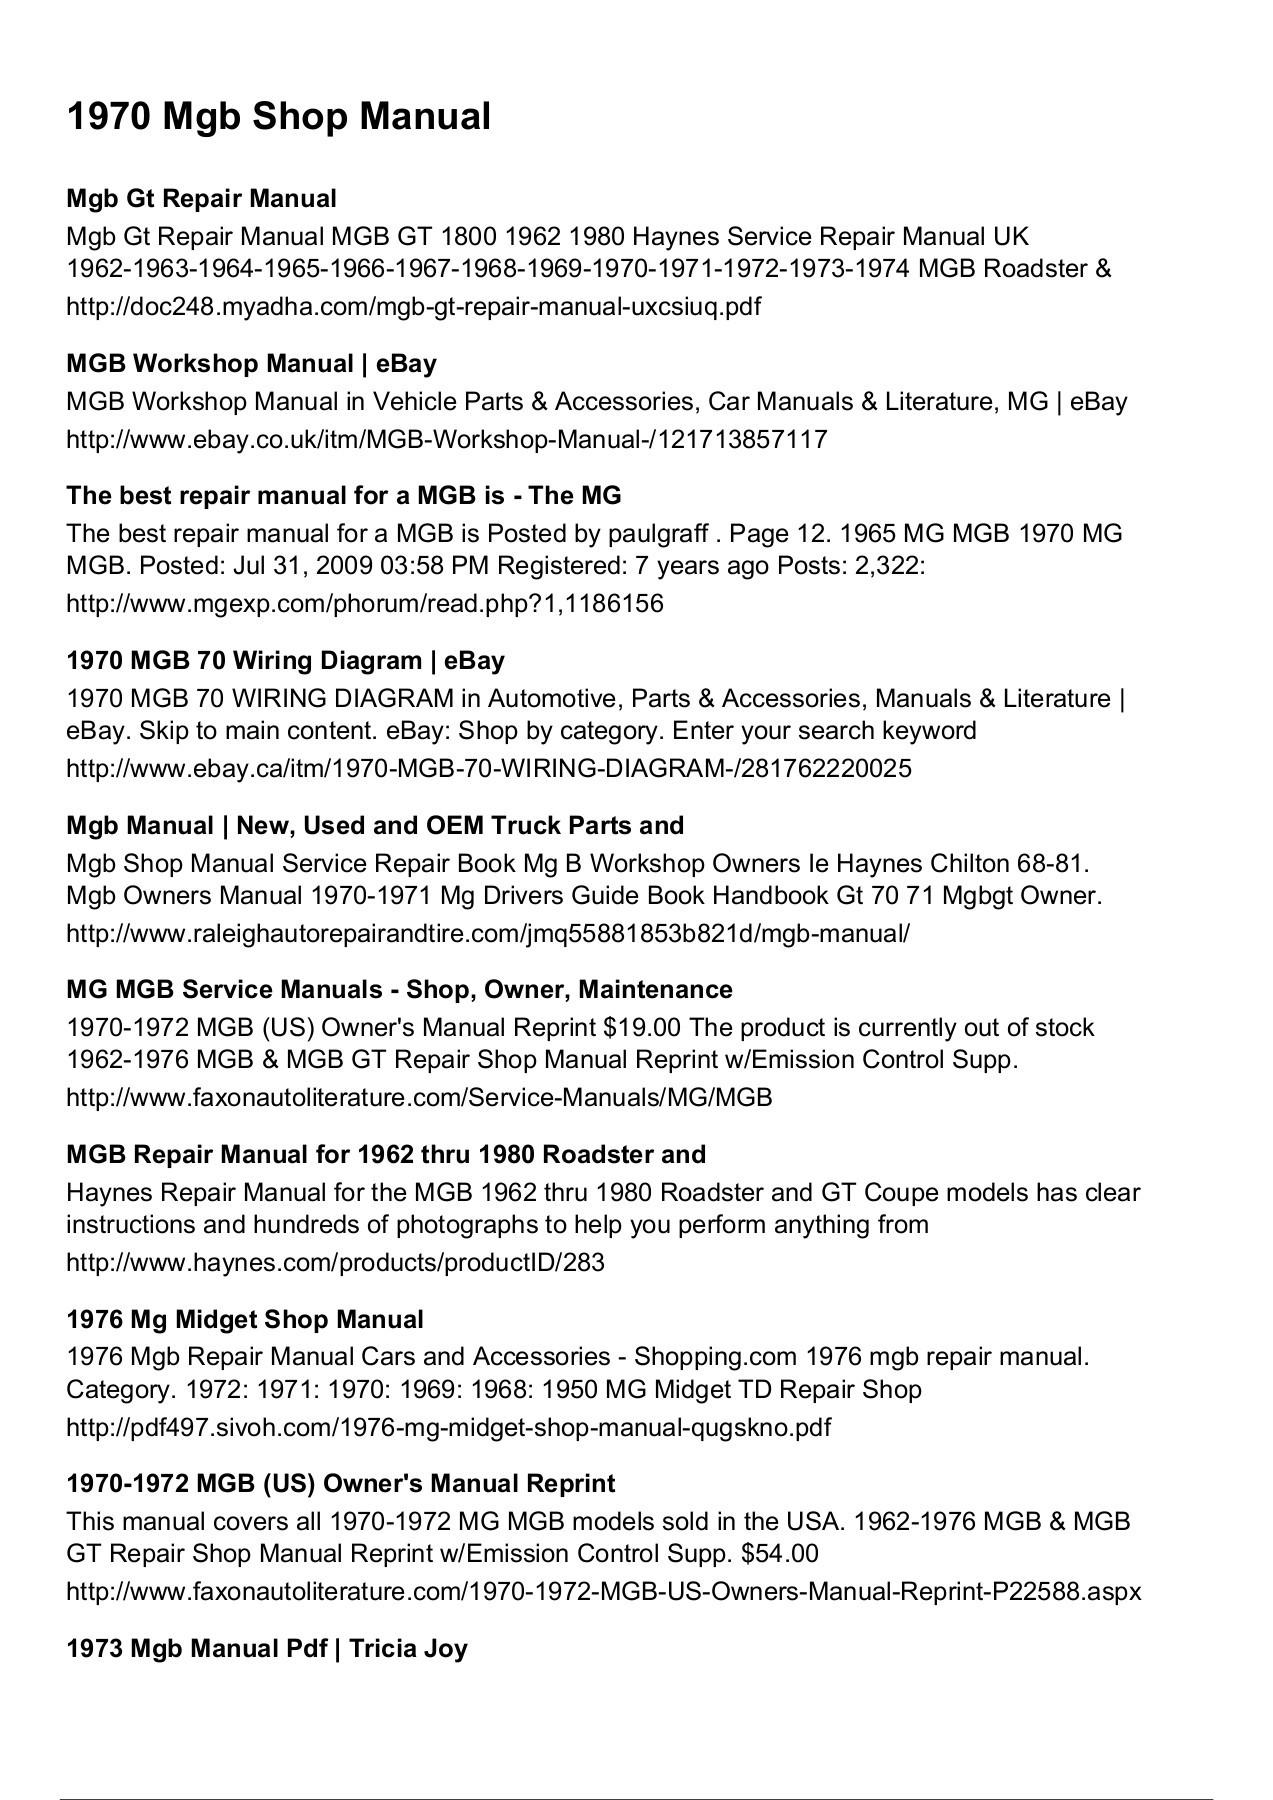 Wondrous 1970 Mgb Shop Manual Wiring Cloud Rometaidewilluminateatxorg